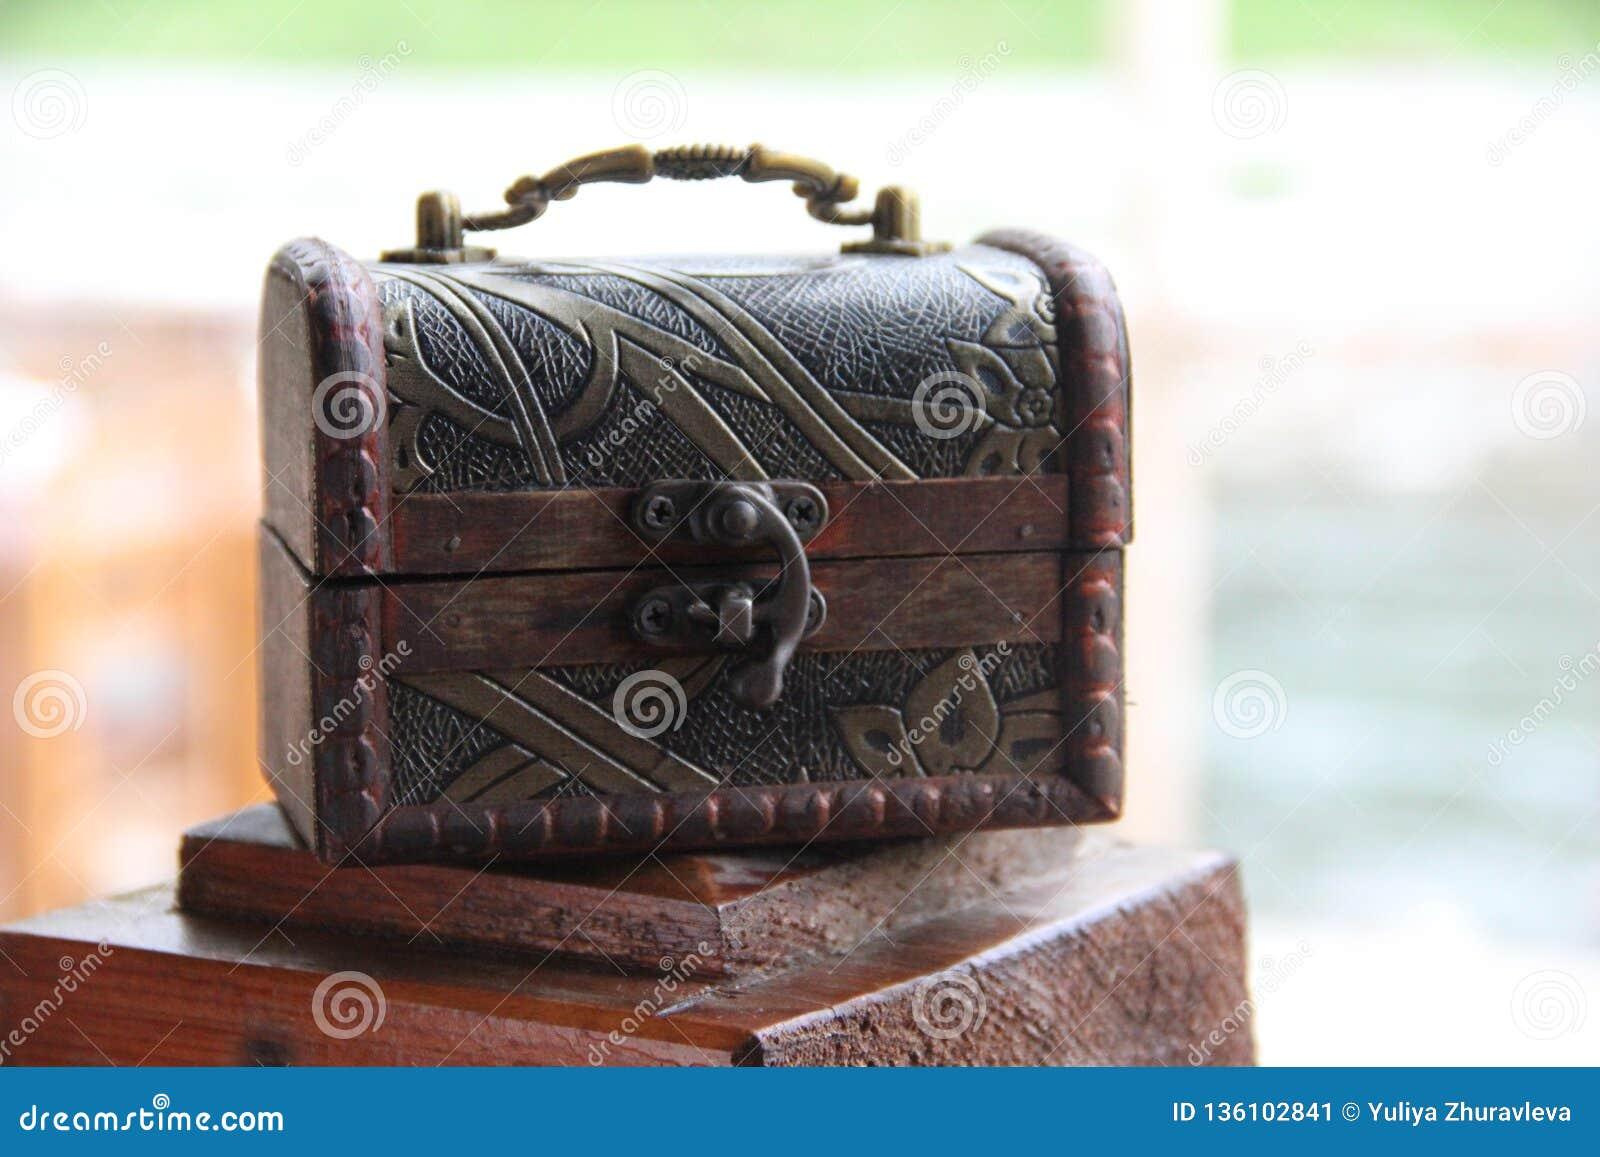 Cantine De Voyage Metallique petit coffre metal baa88677 - banphotphisai